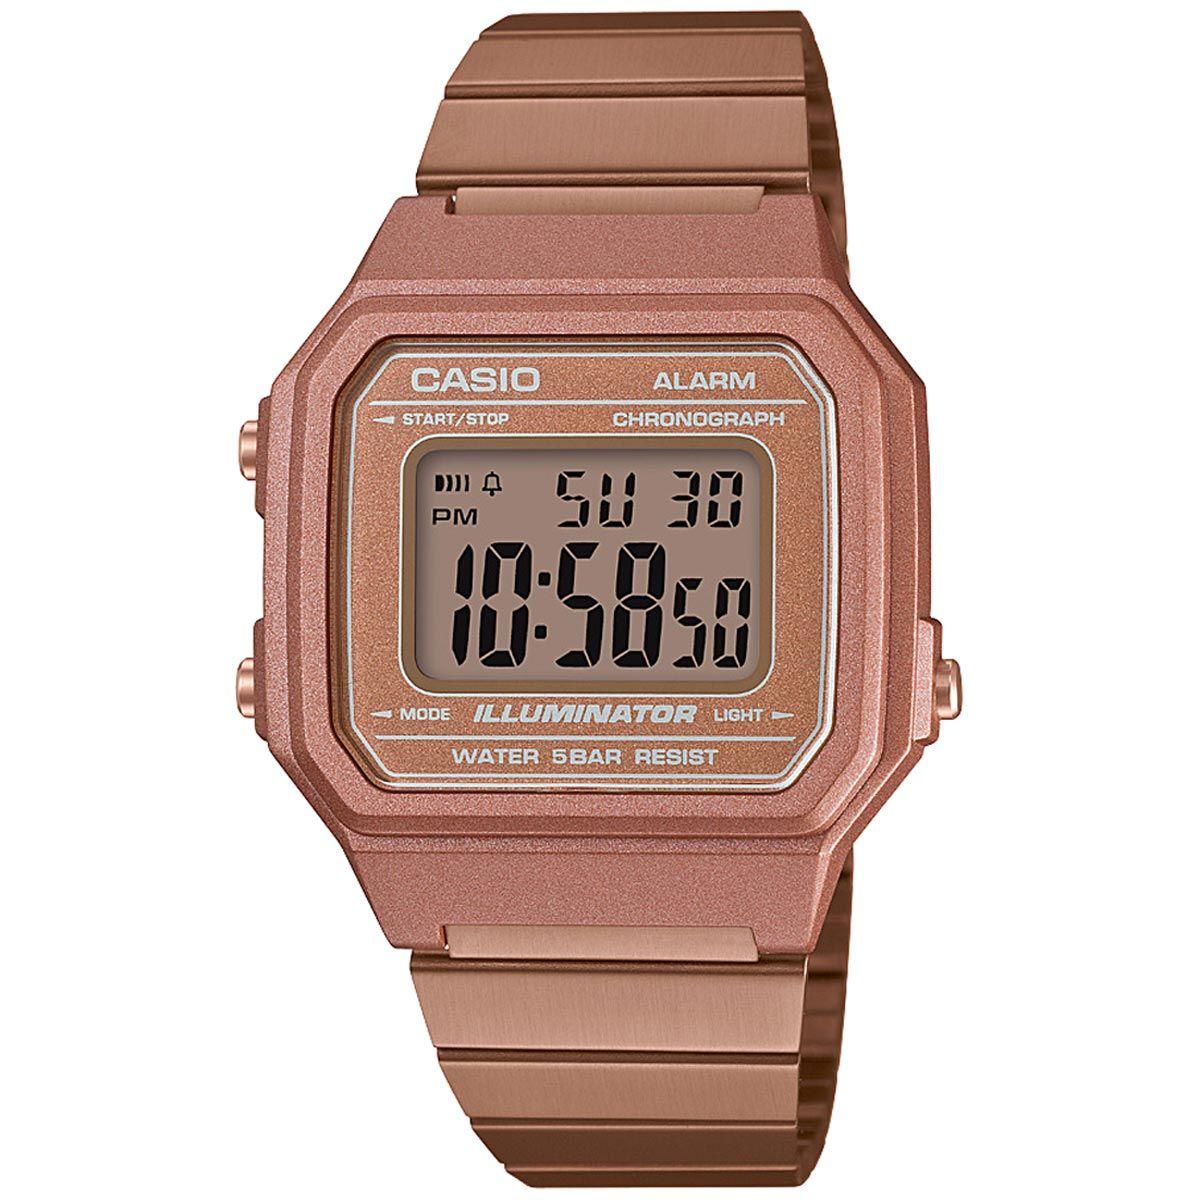 a6bc4f0bc04 Relógio Casio Unissex Vintage B650WC-5ADF - Relógios de Fábrica